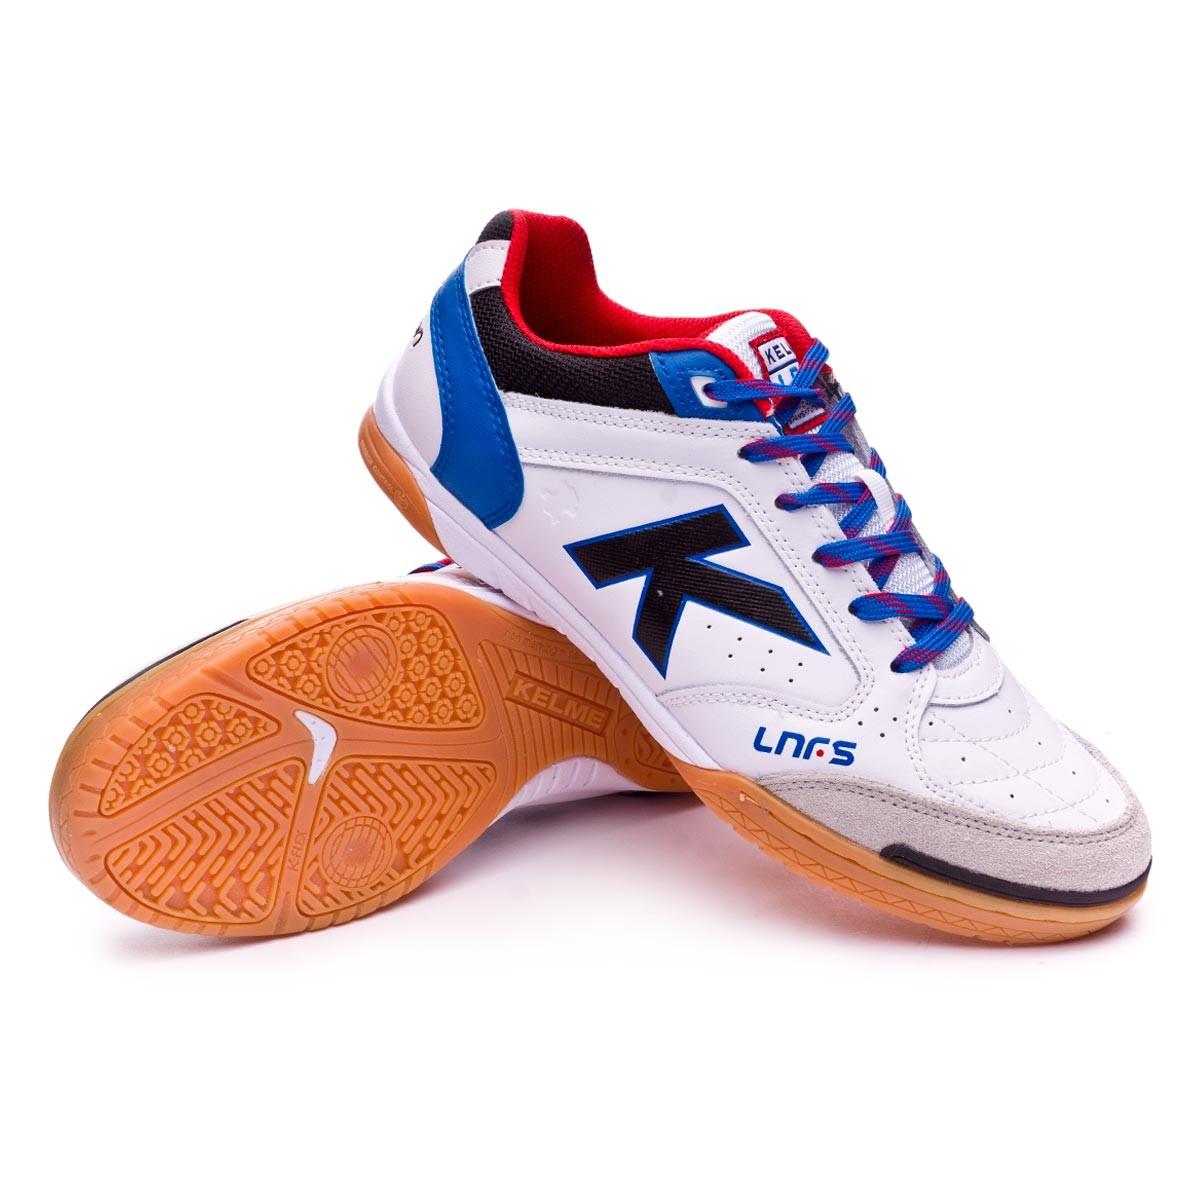 Sapatilha de Futsal Kelme Precision LNFS Leather